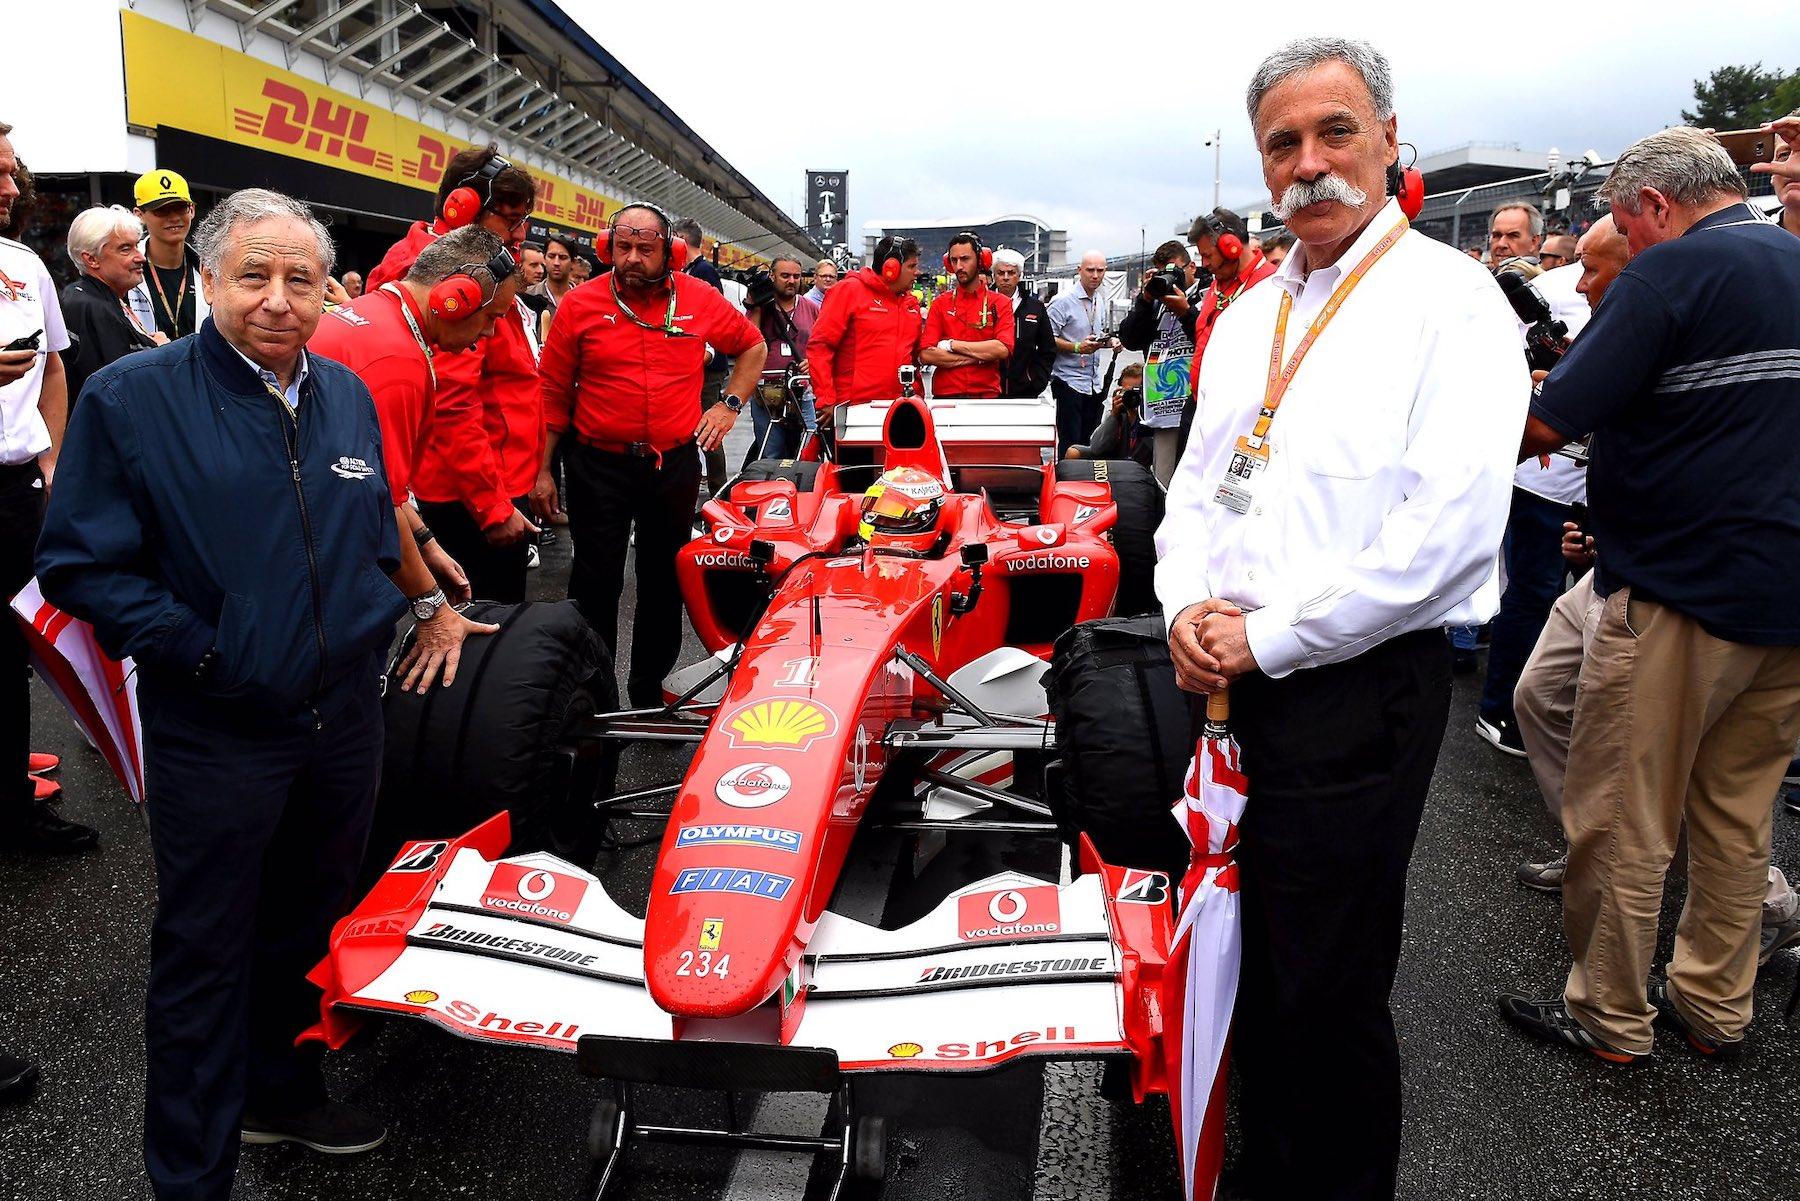 2019 Mick Schumacher | Ferrari F2004 | 2019 German GP 15 copy.jpg